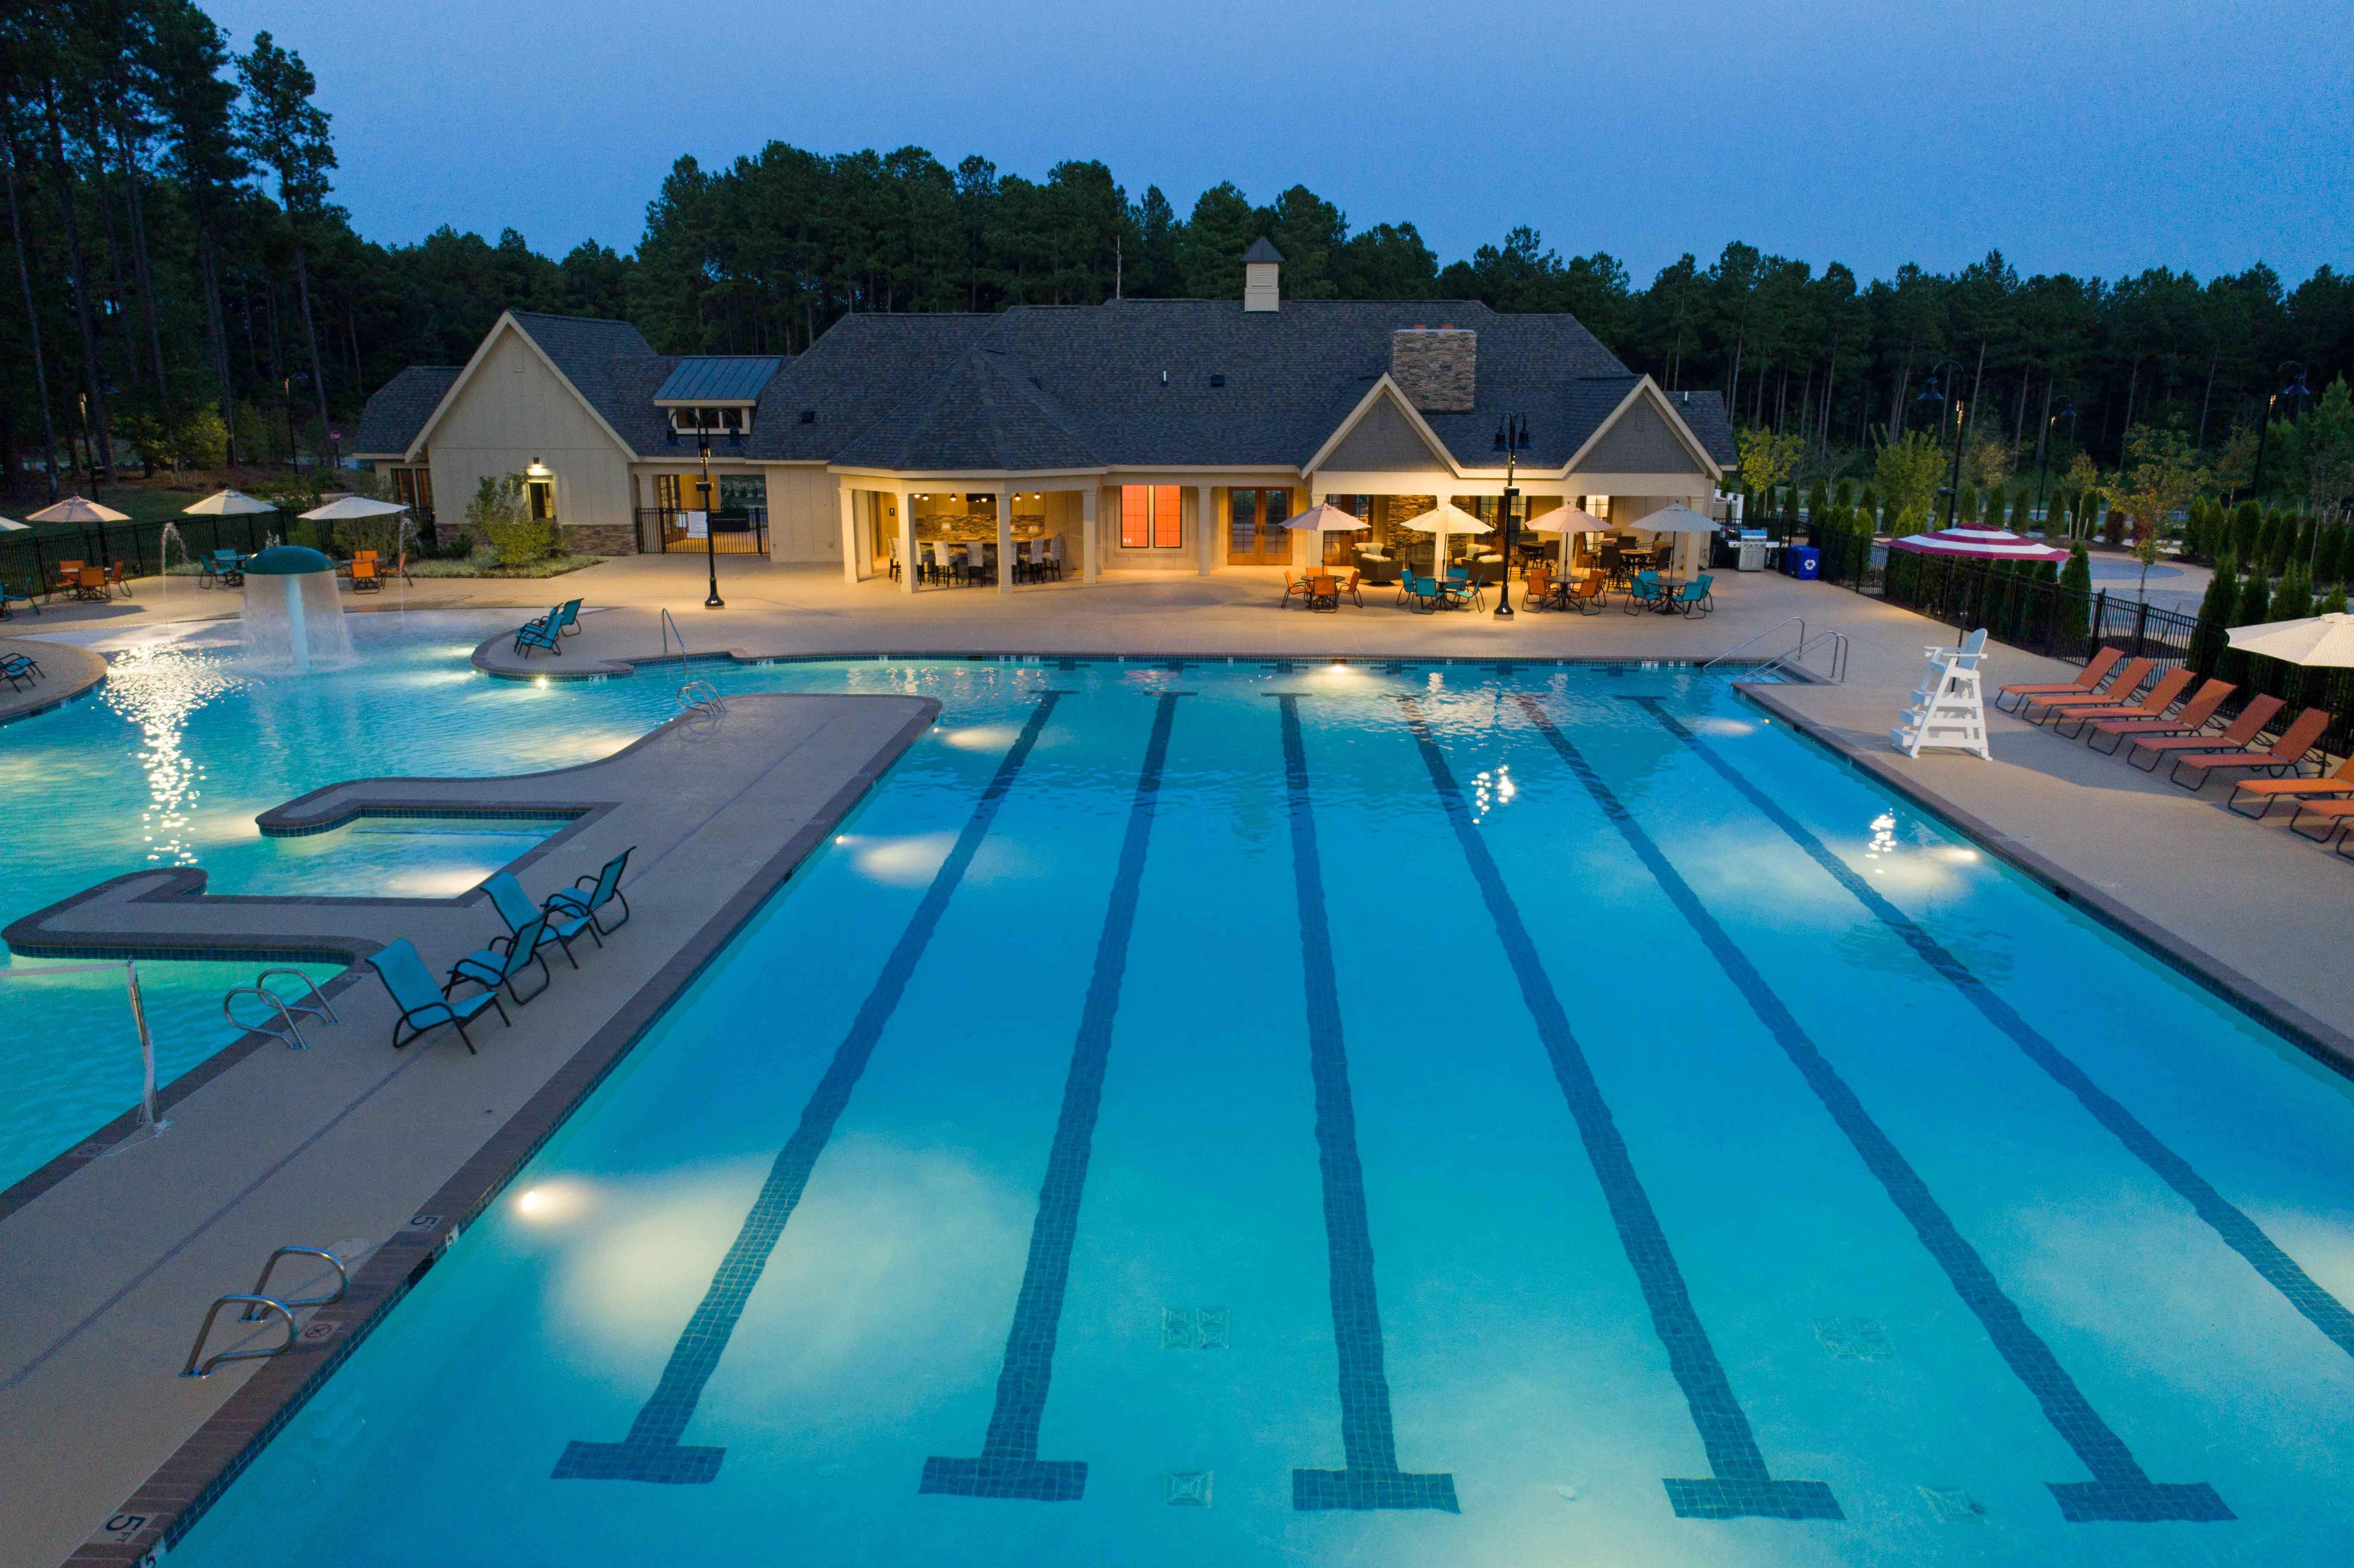 Harpers Mill Nighttime Pool